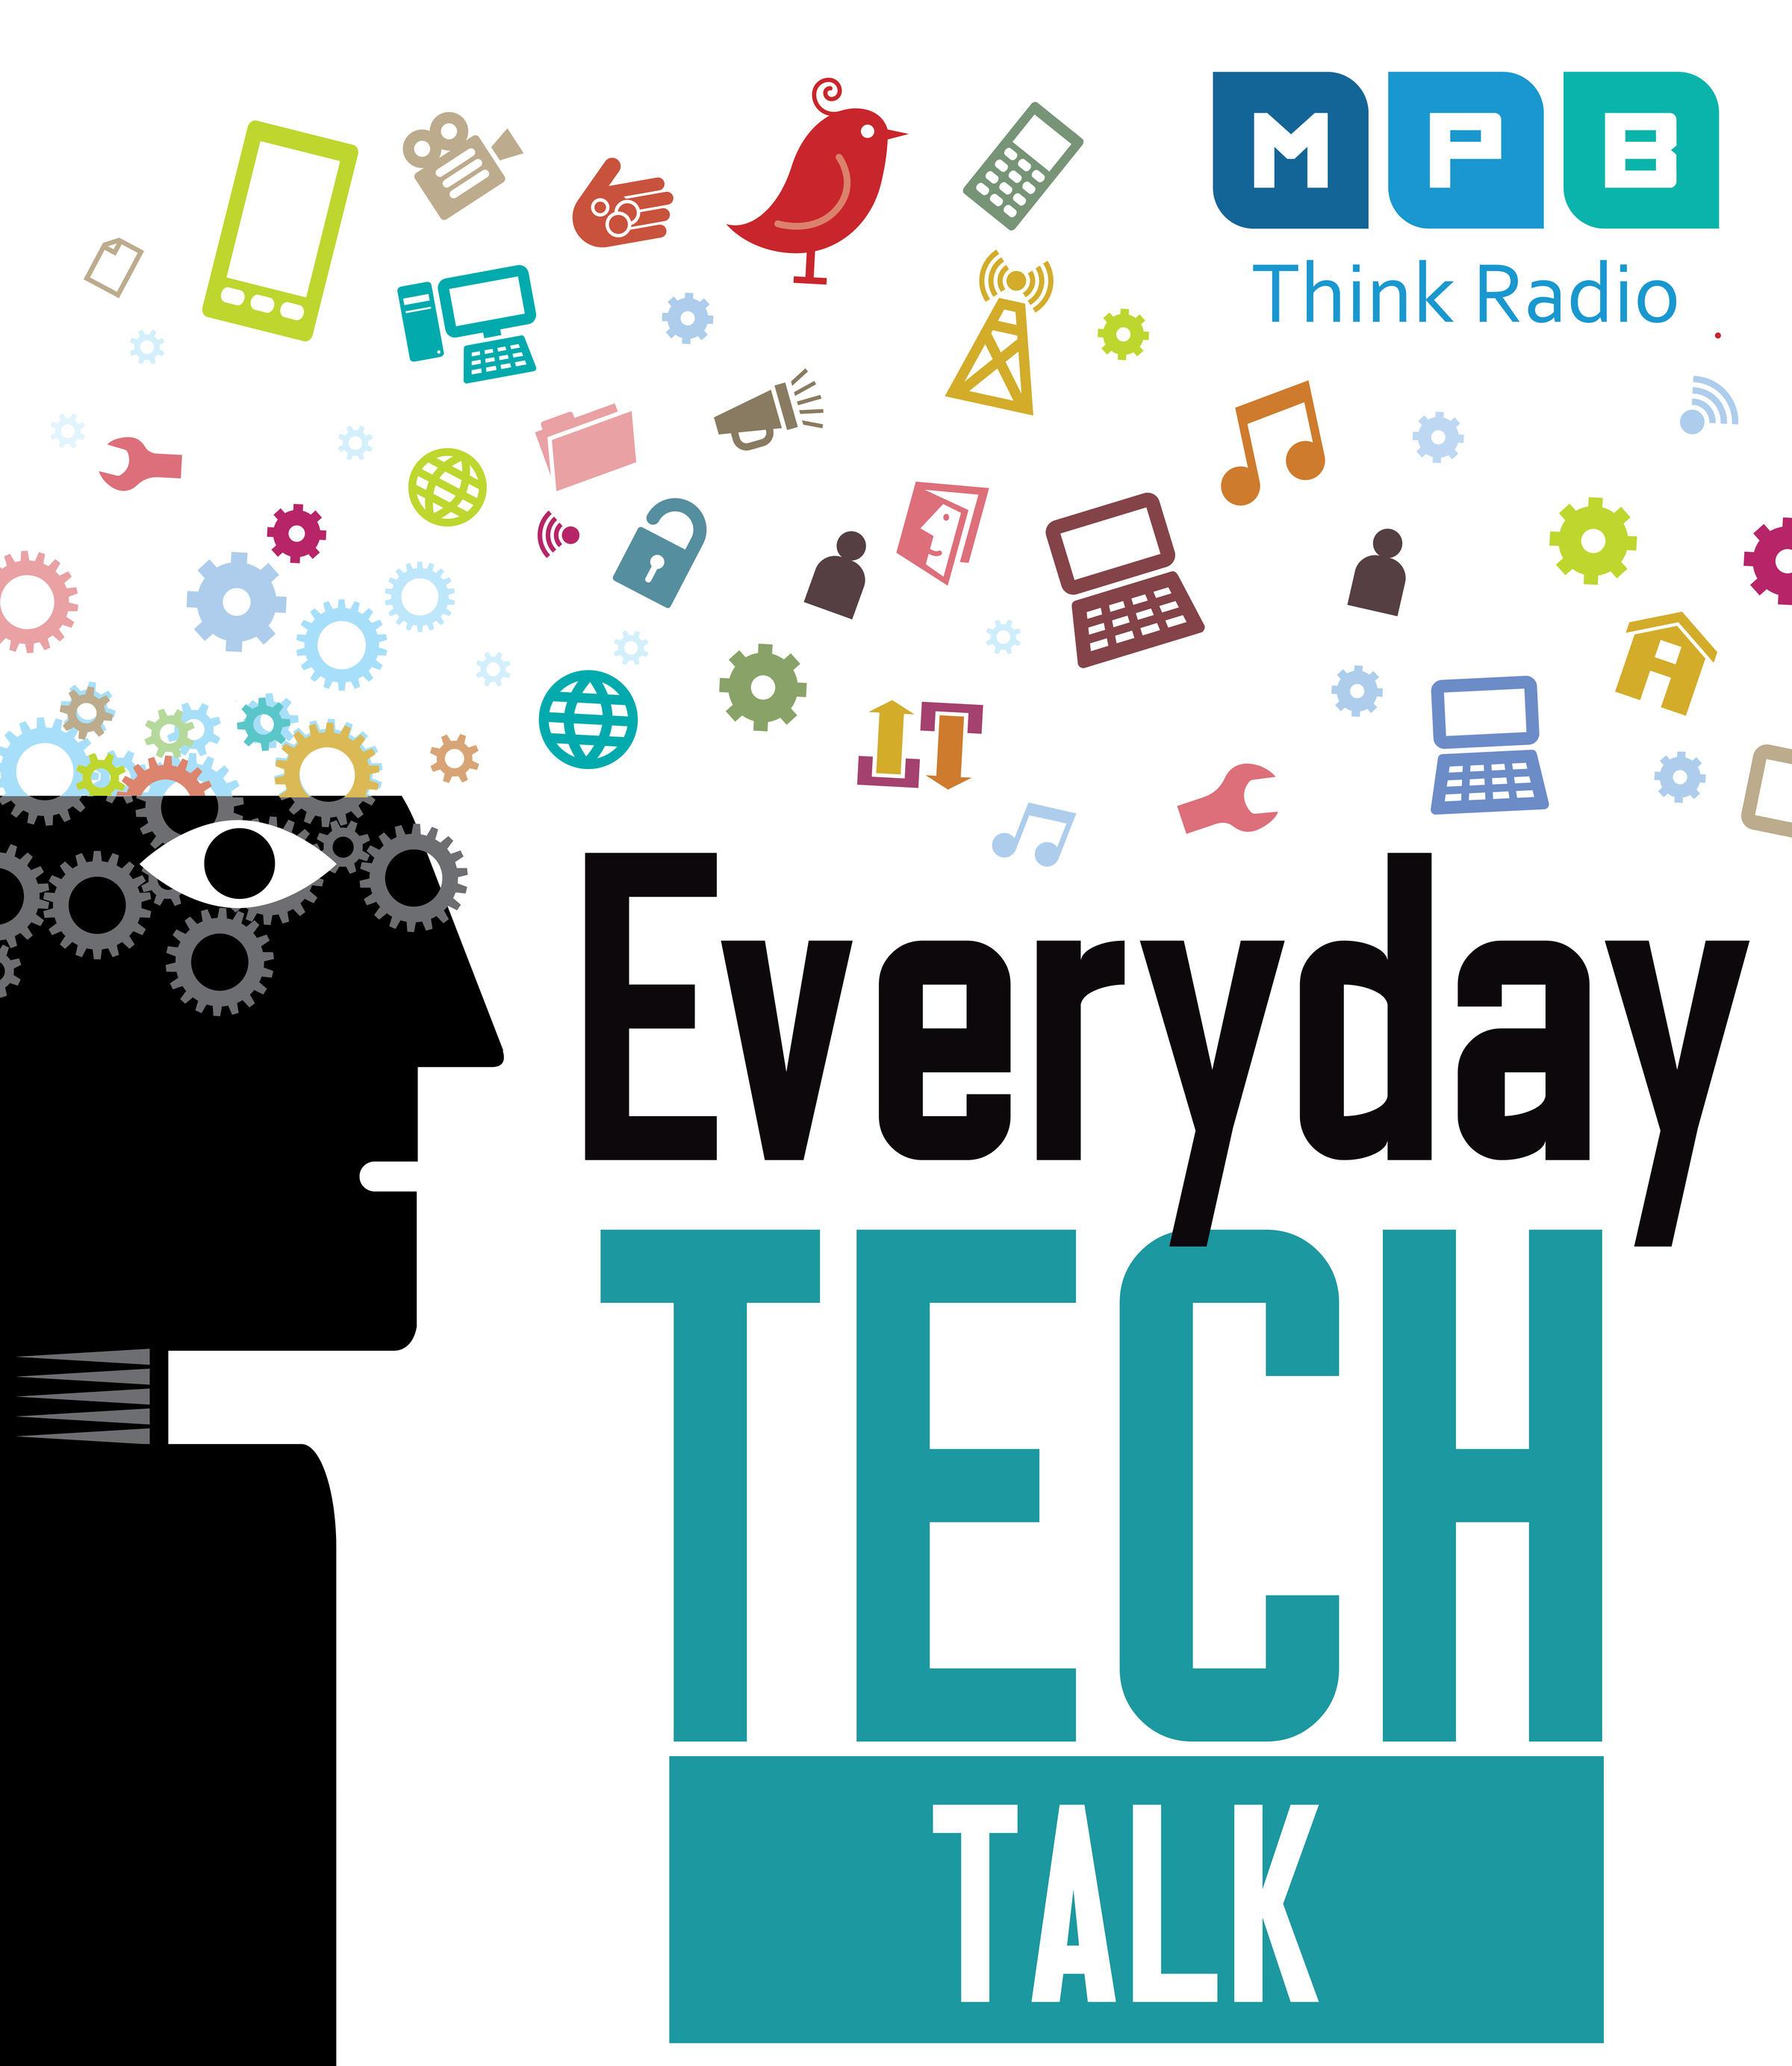 Everyday Tech Talk | Peoria Public Radio